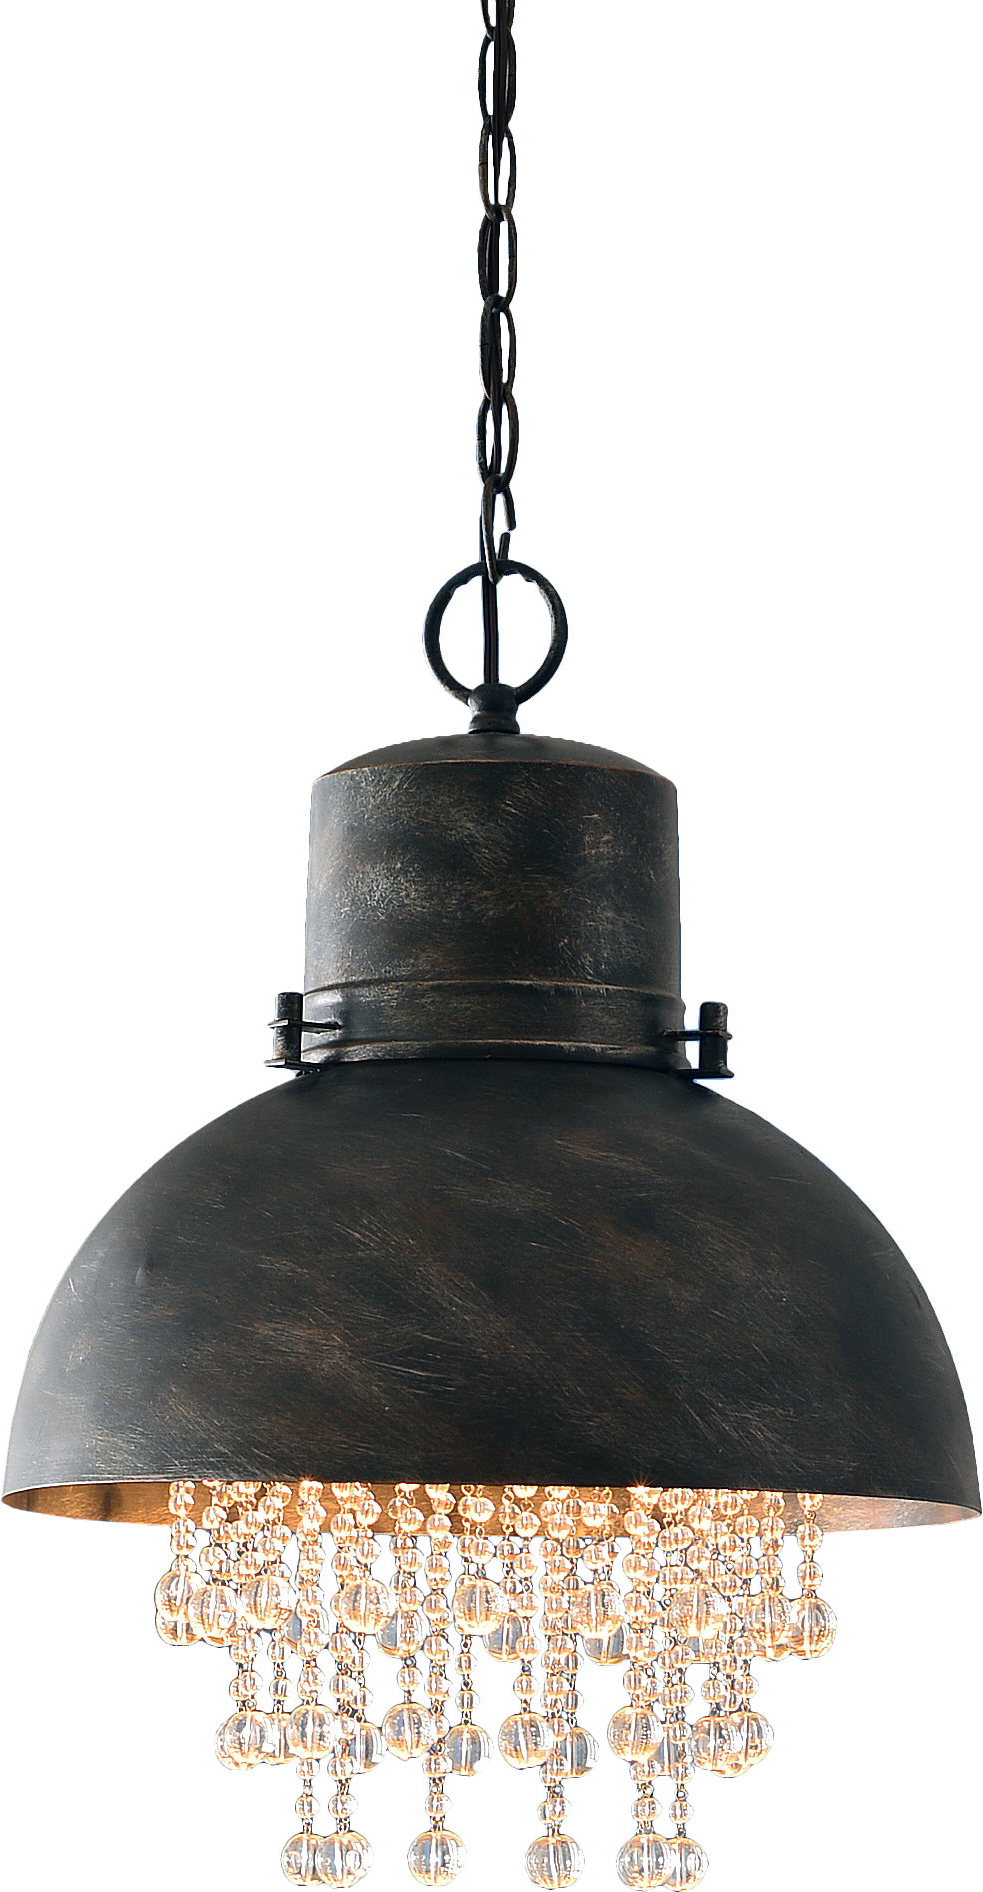 Monadnock 1 Light Single Dome Pendants For Popular Monadnock 1 Light Dome Pendant (View 9 of 20)